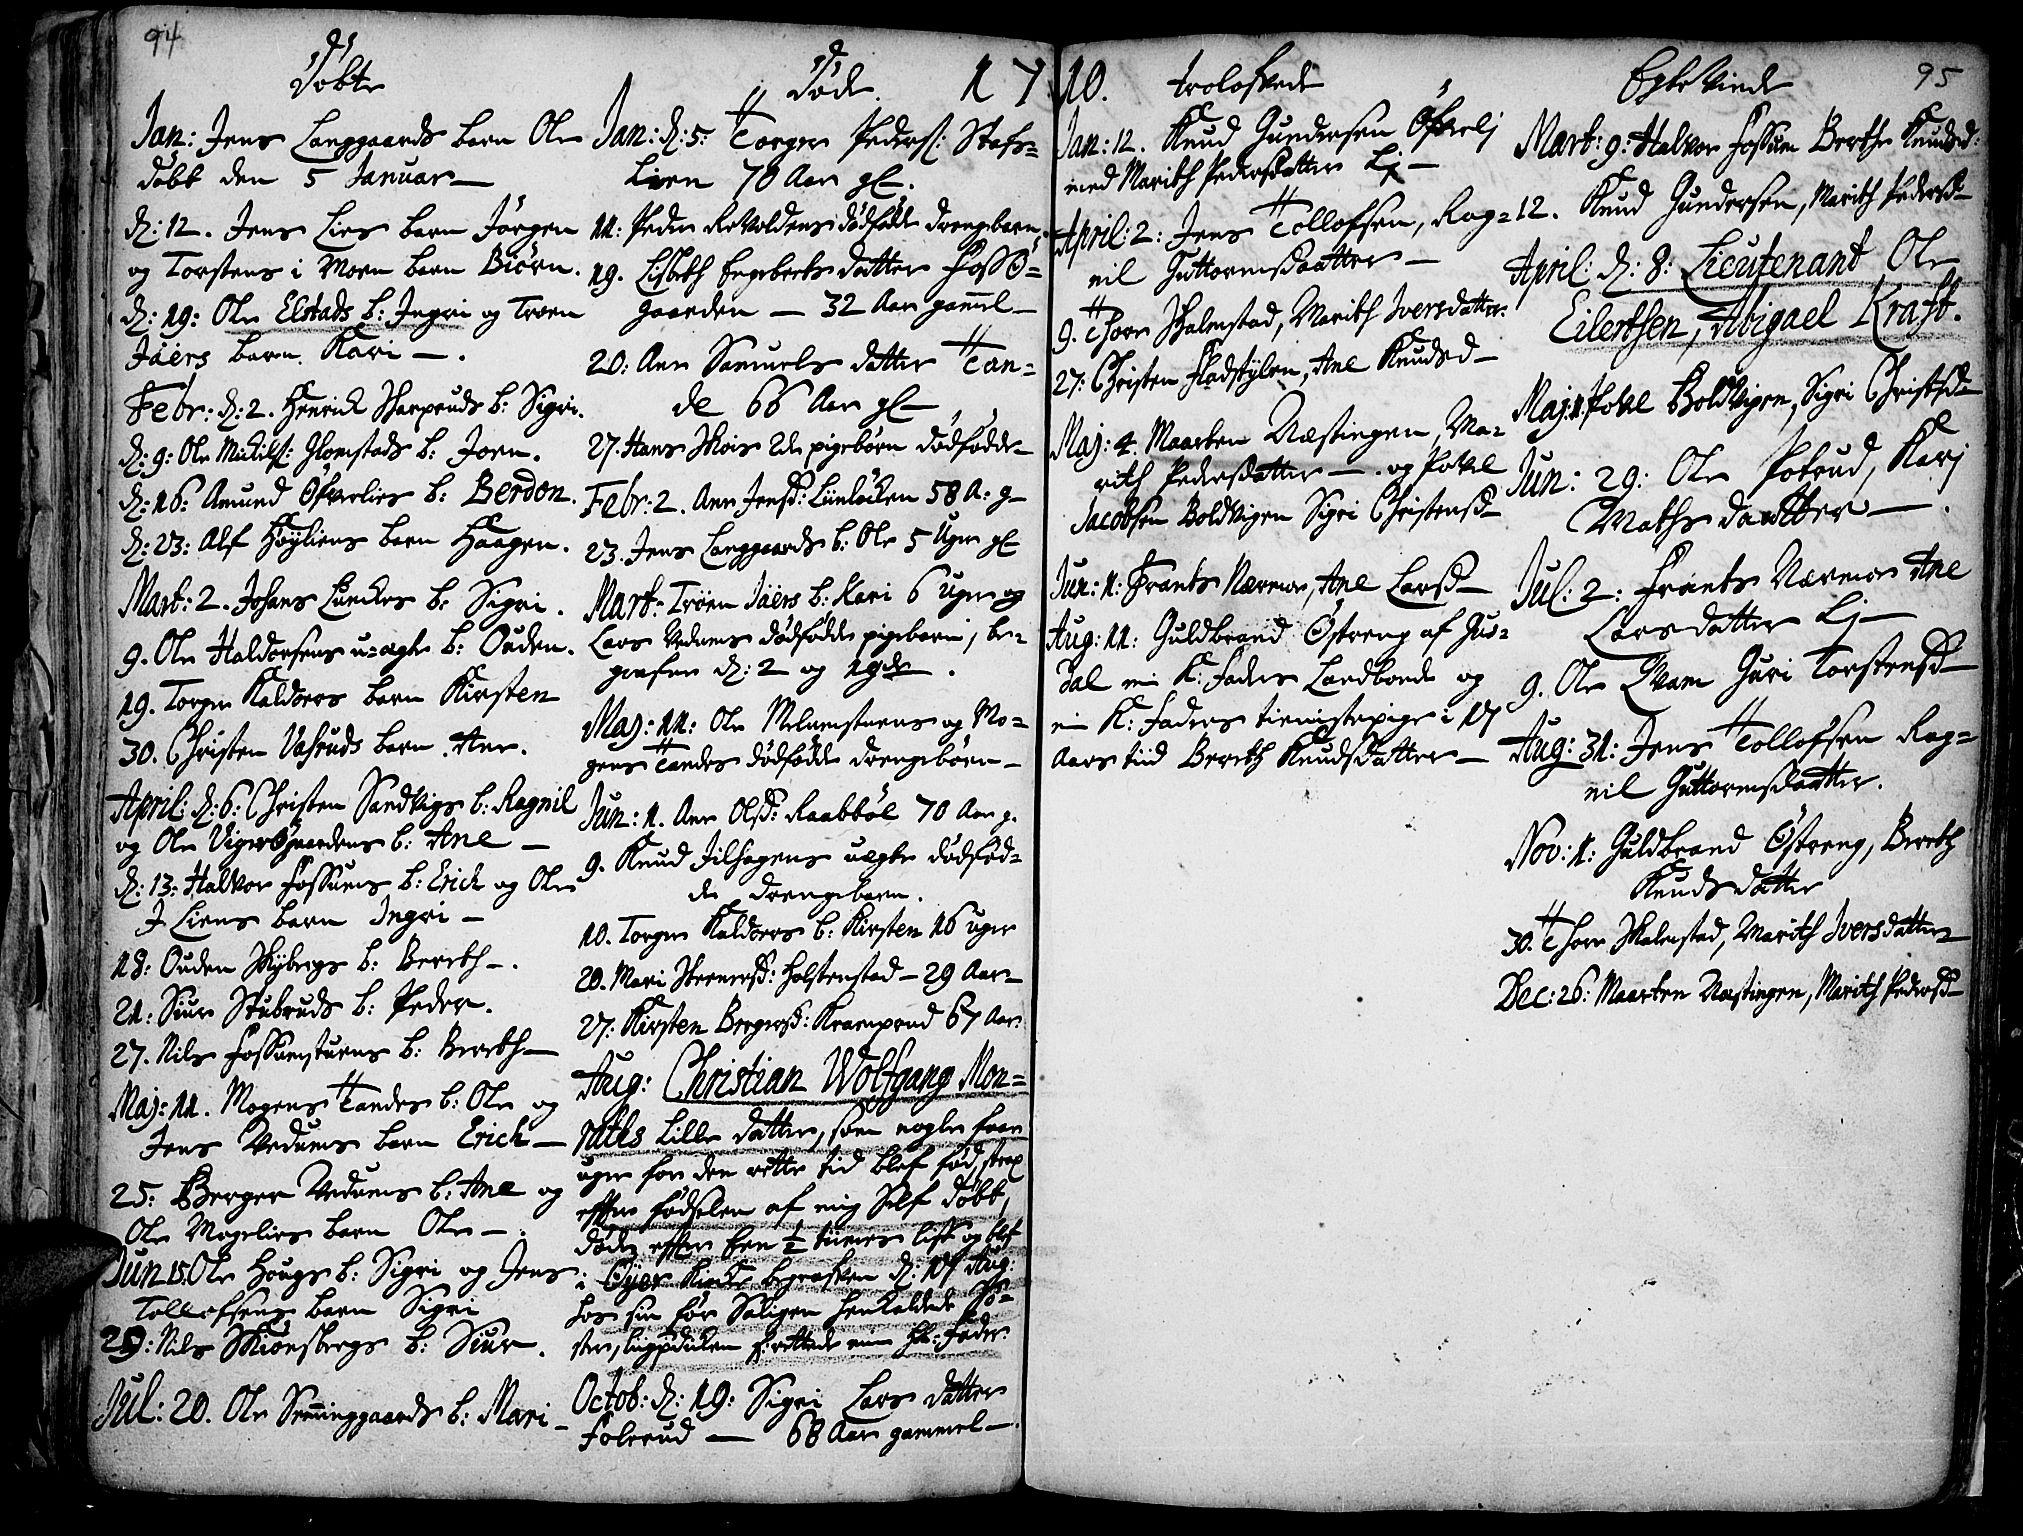 SAH, Øyer prestekontor, Ministerialbok nr. 1, 1671-1727, s. 94-95